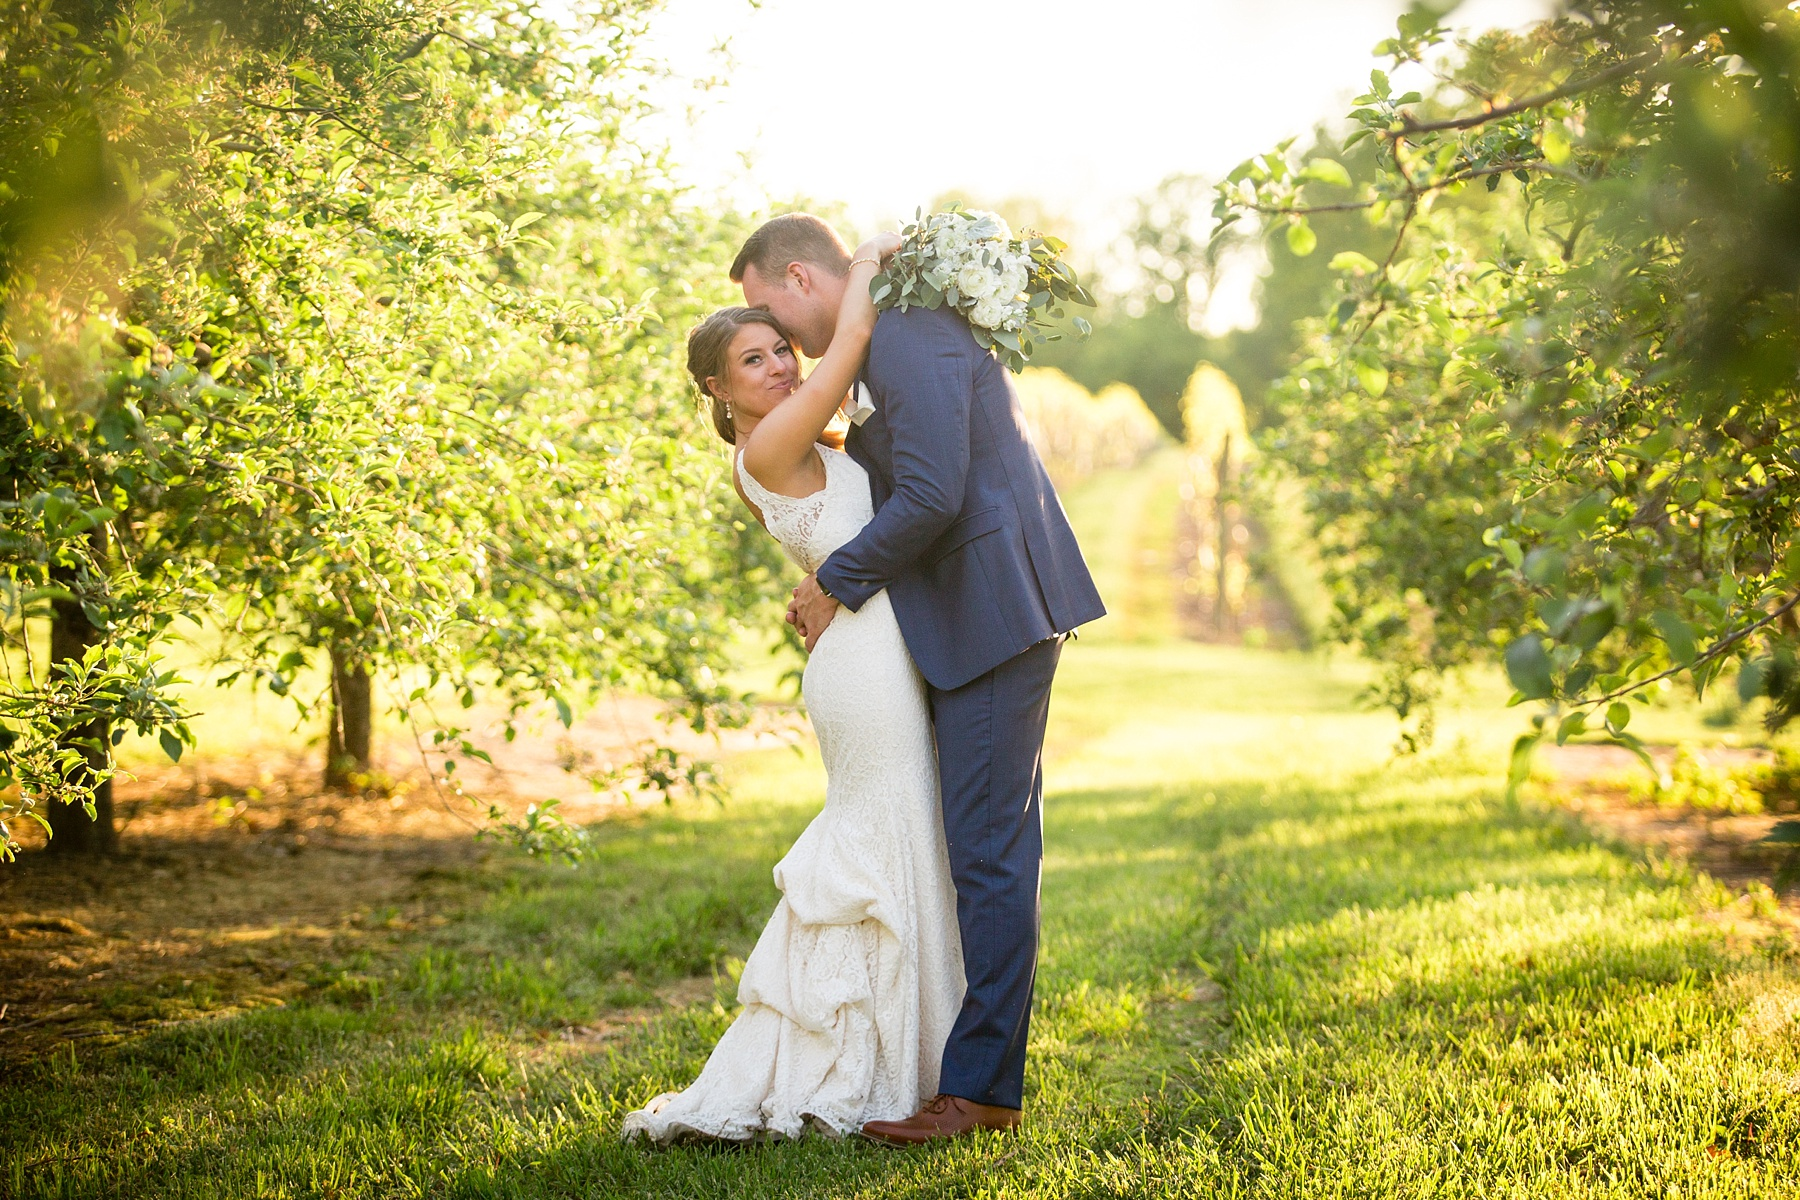 Brandon_Shafer_Photography_Kara_Doug_12_corners_Wedding_Benton_Harbor_0078.jpg